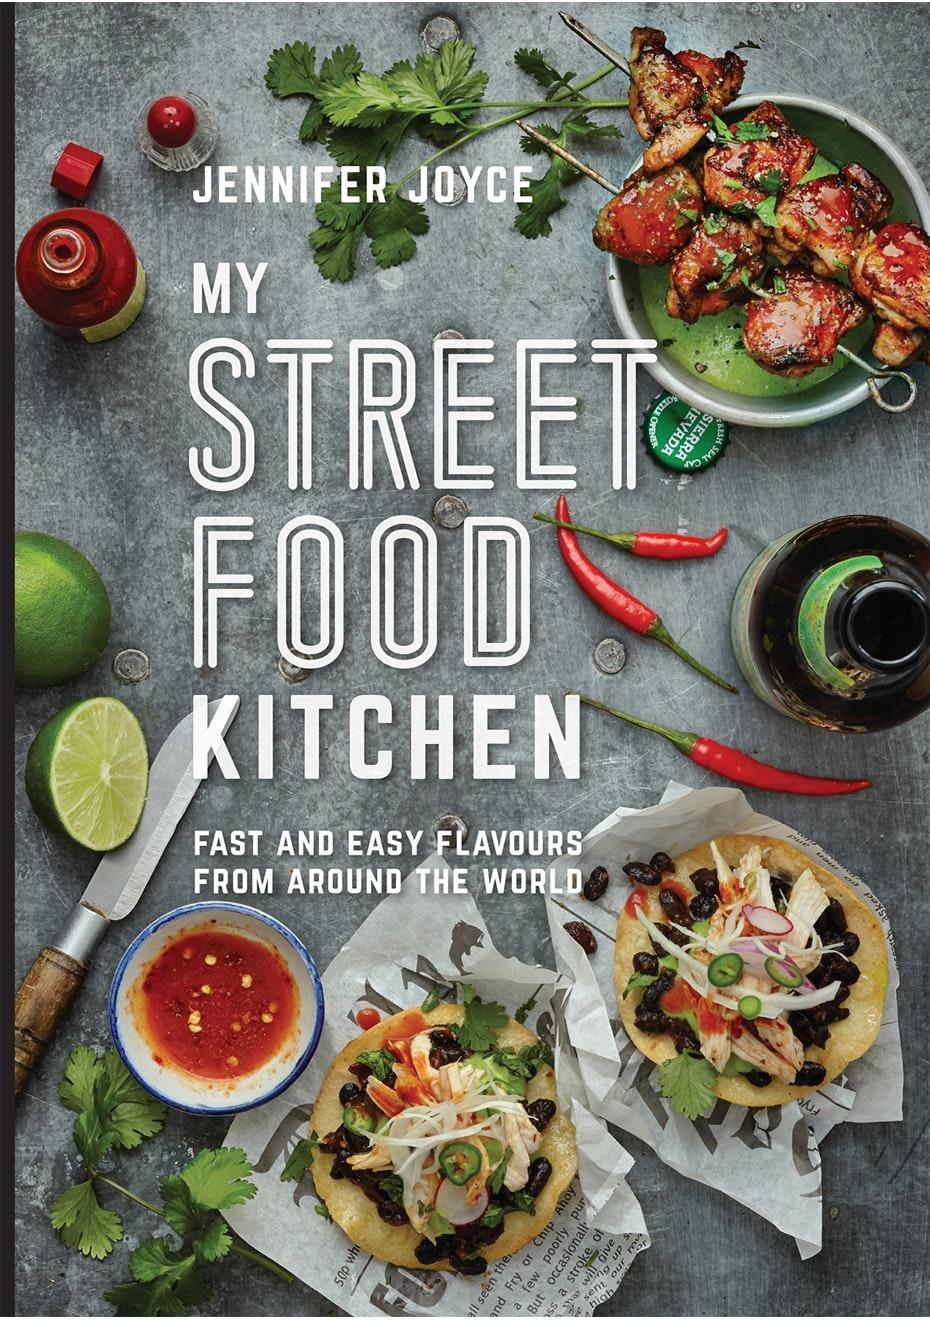 My Street Food Kitchen, Jennifer Joyce